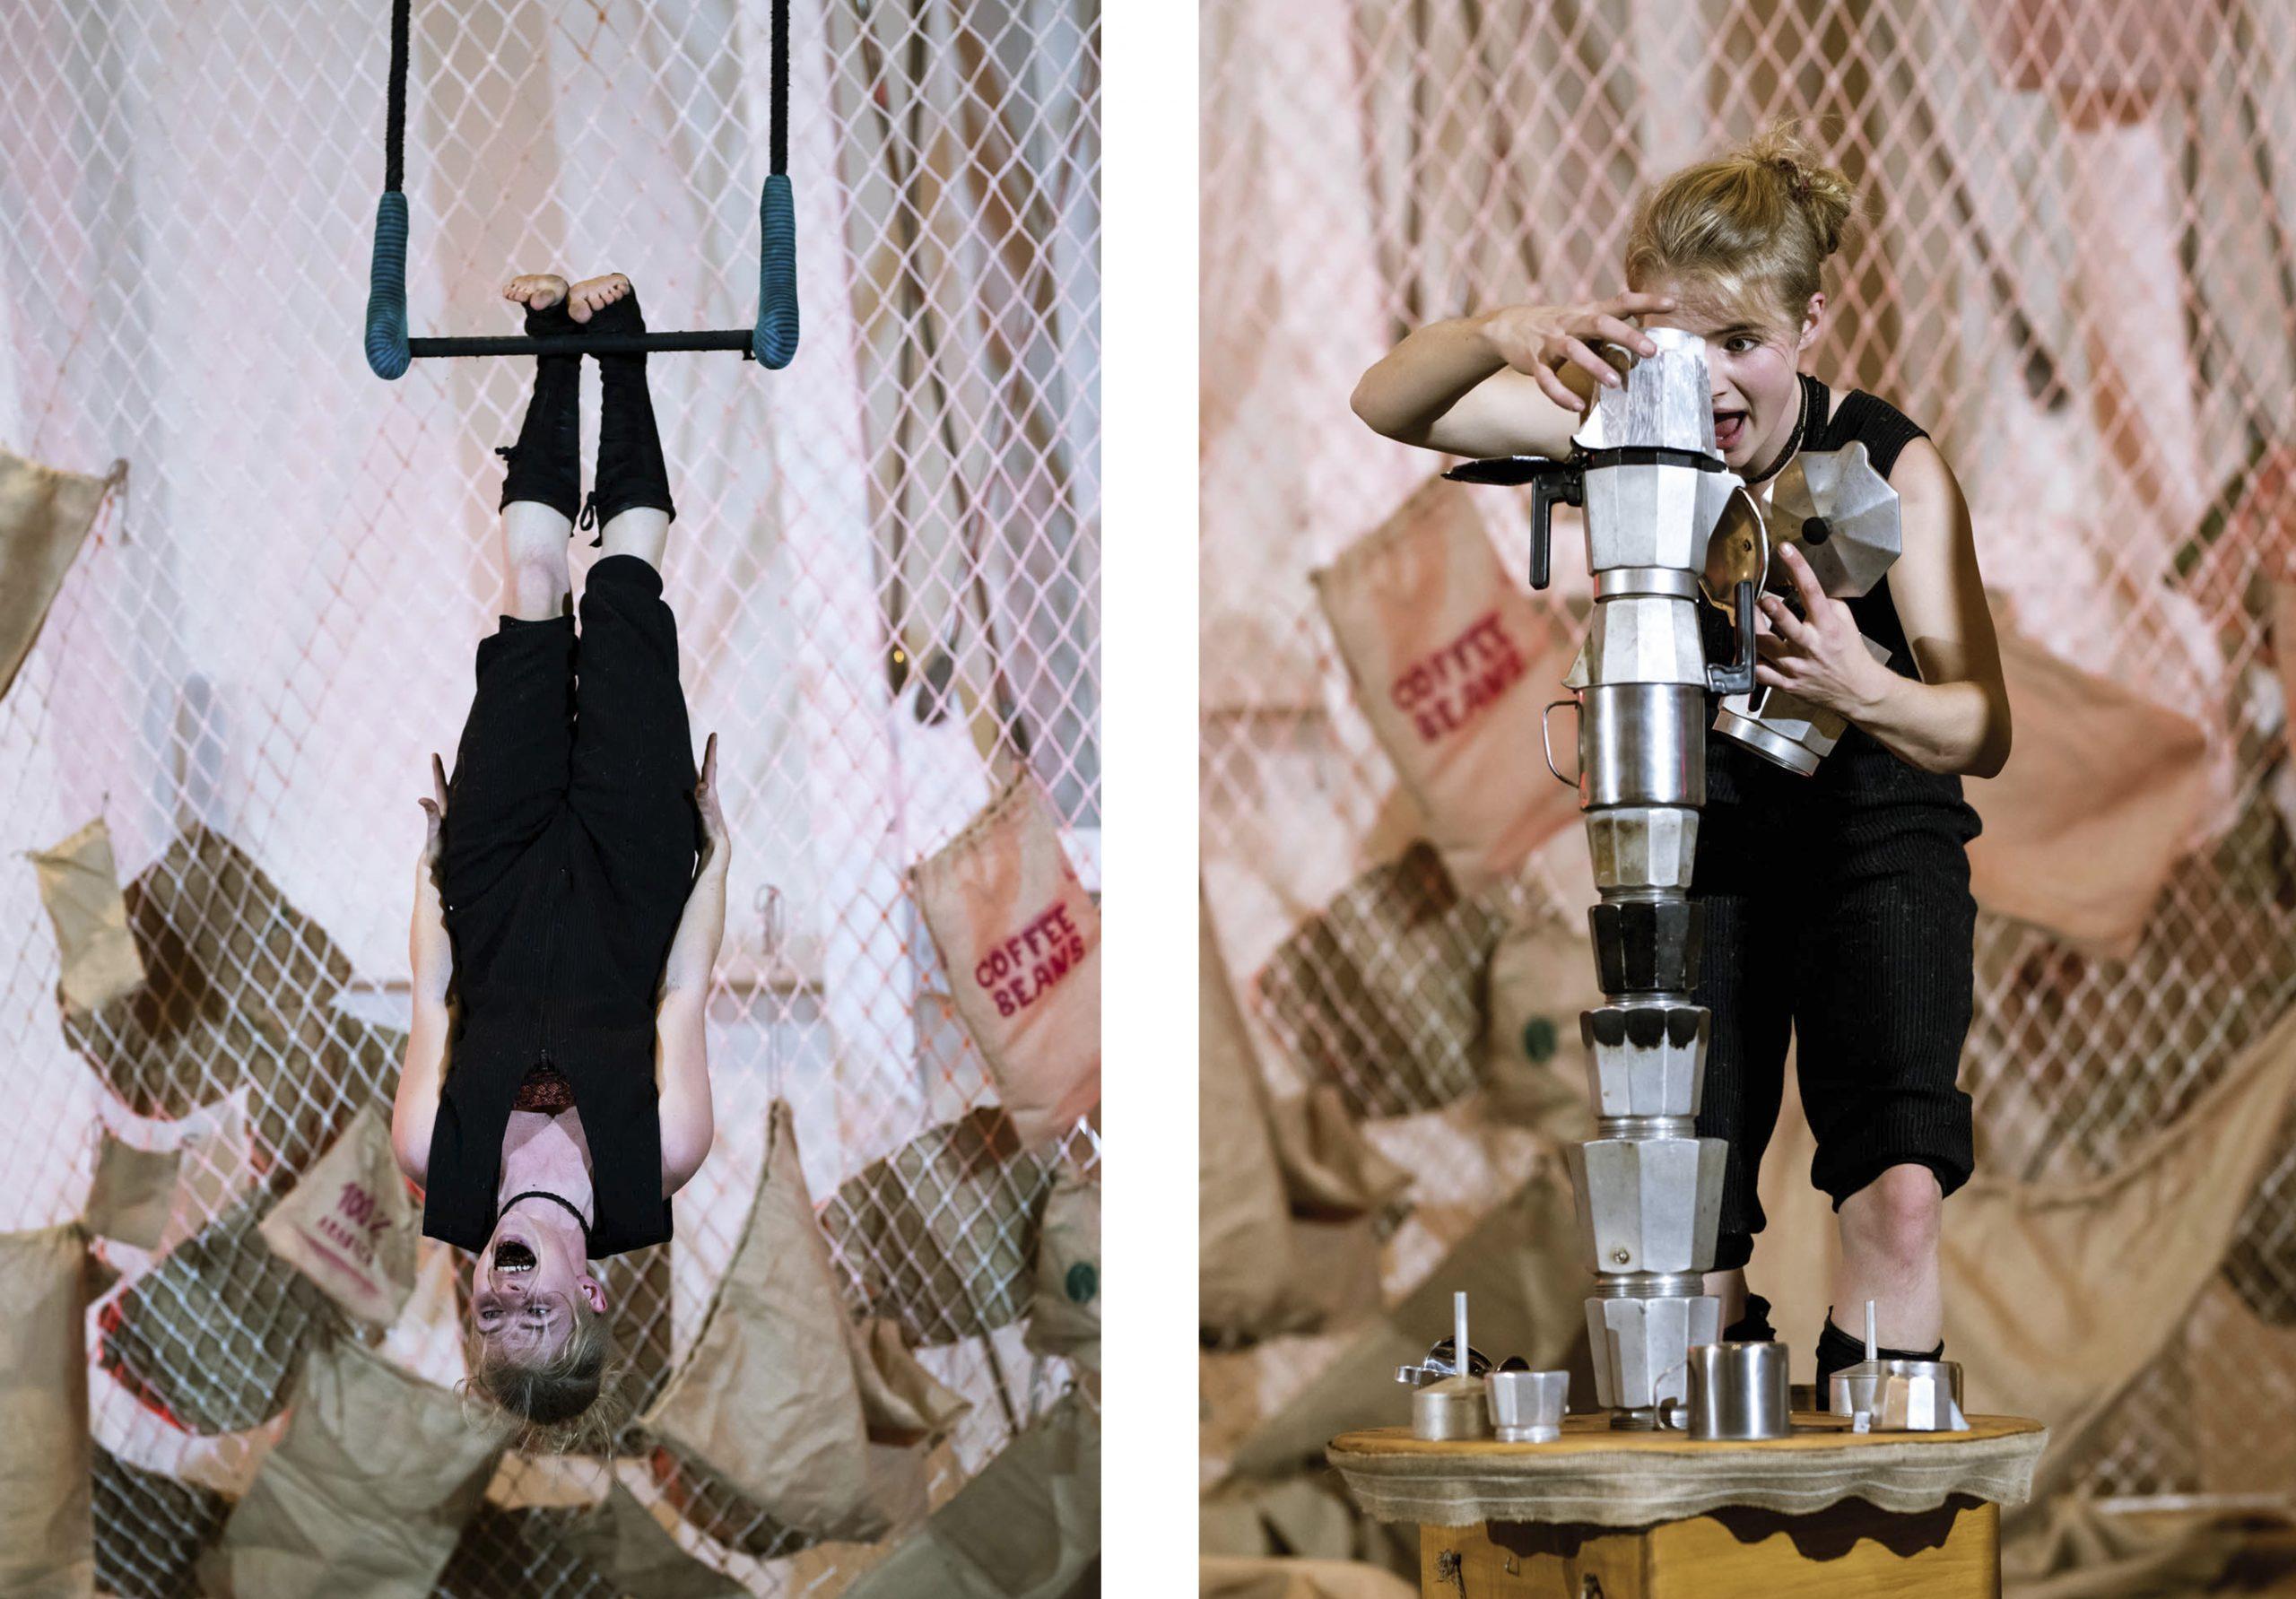 JohannaBlog Mai Ibargüen Circo Fotografía Zaragoza